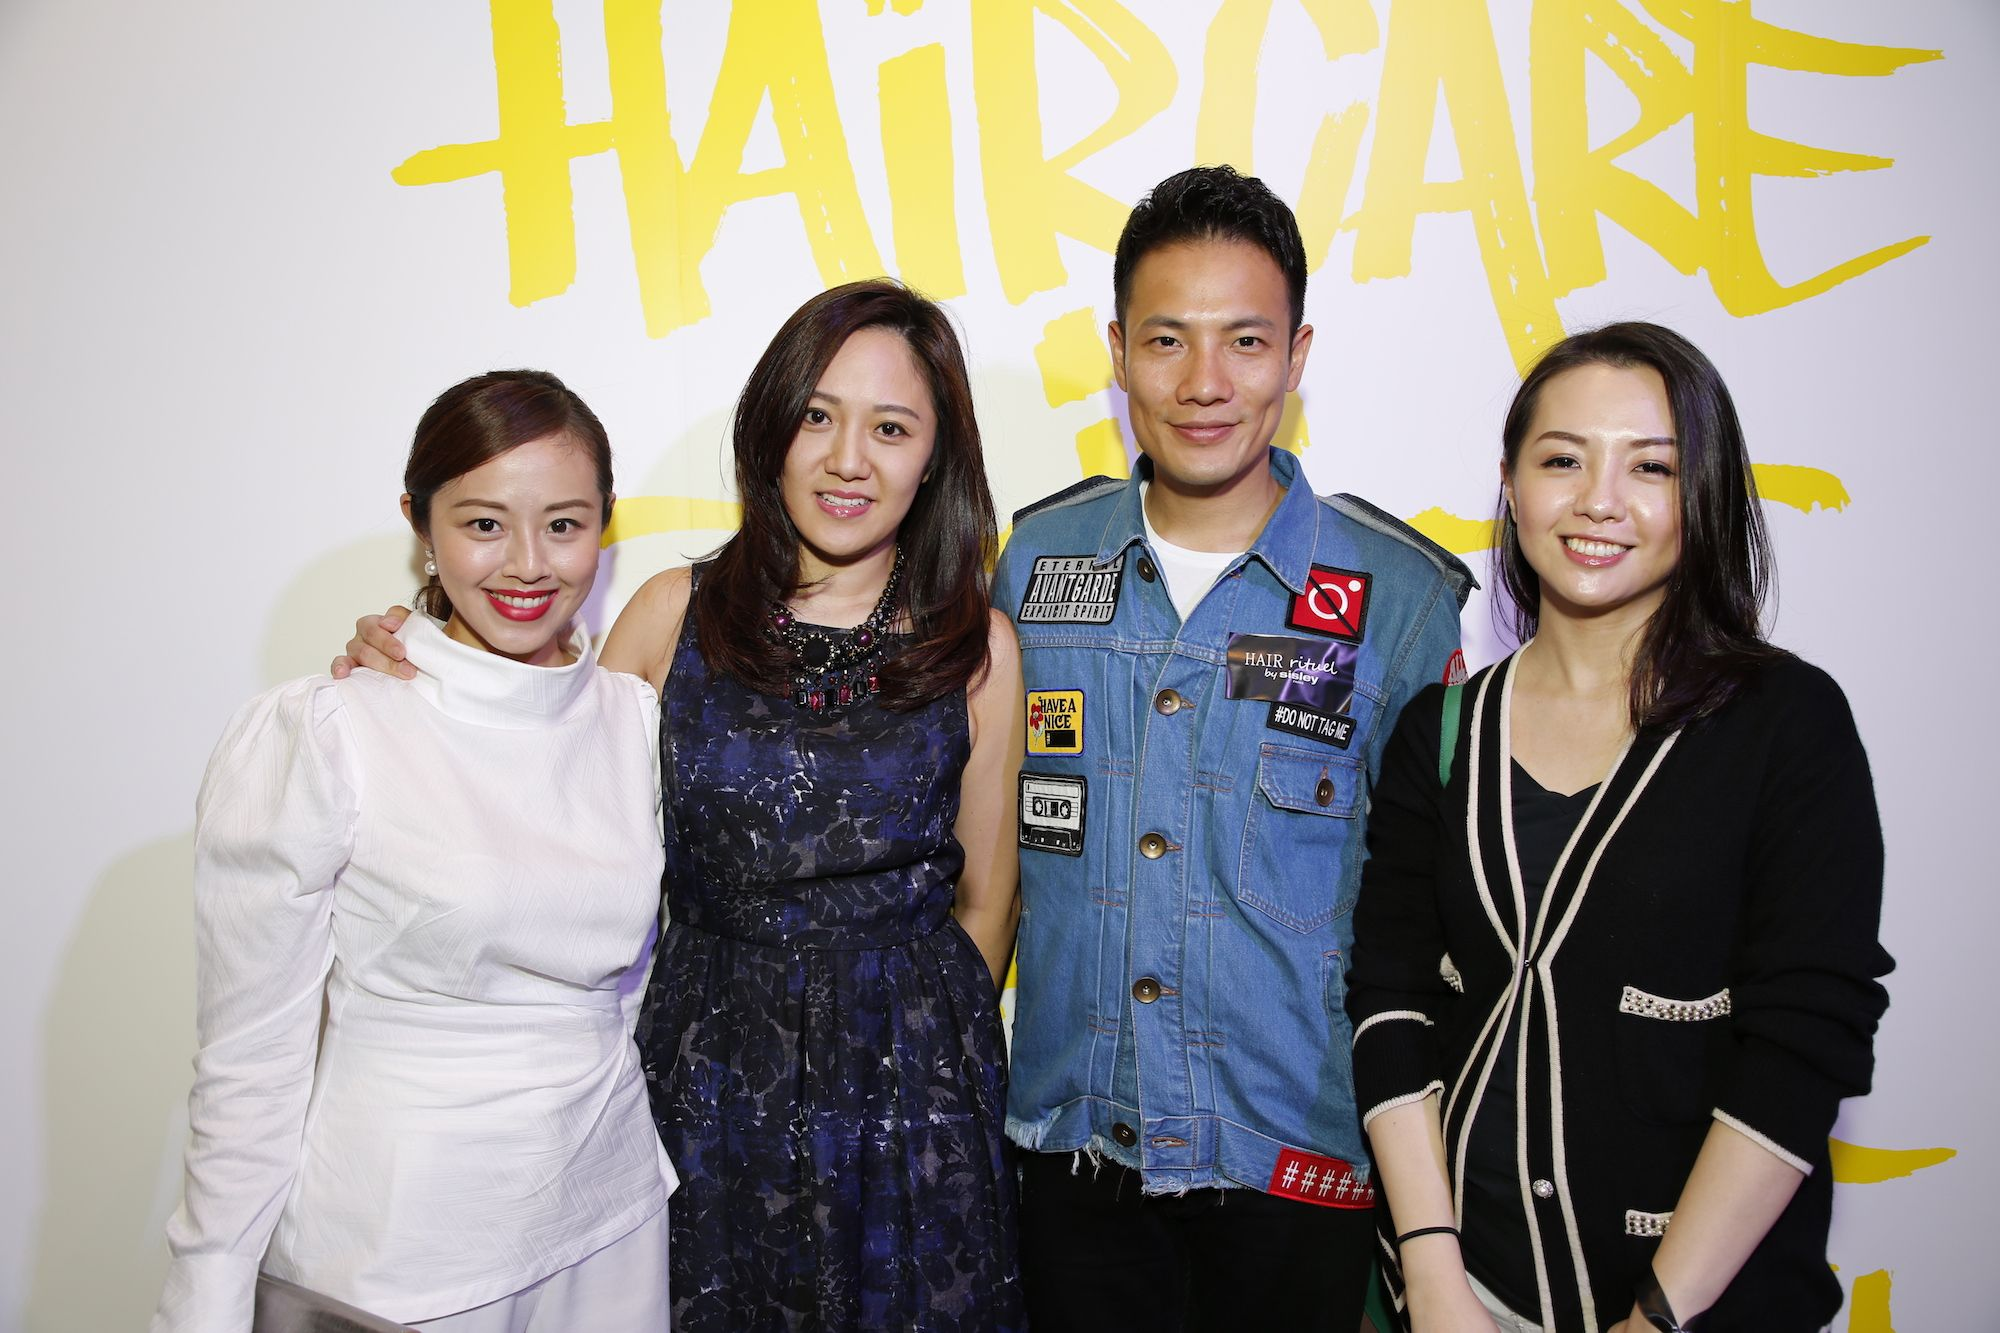 Fiona Zhuang, Jenny Chau, Real Ting, Tammy Wu